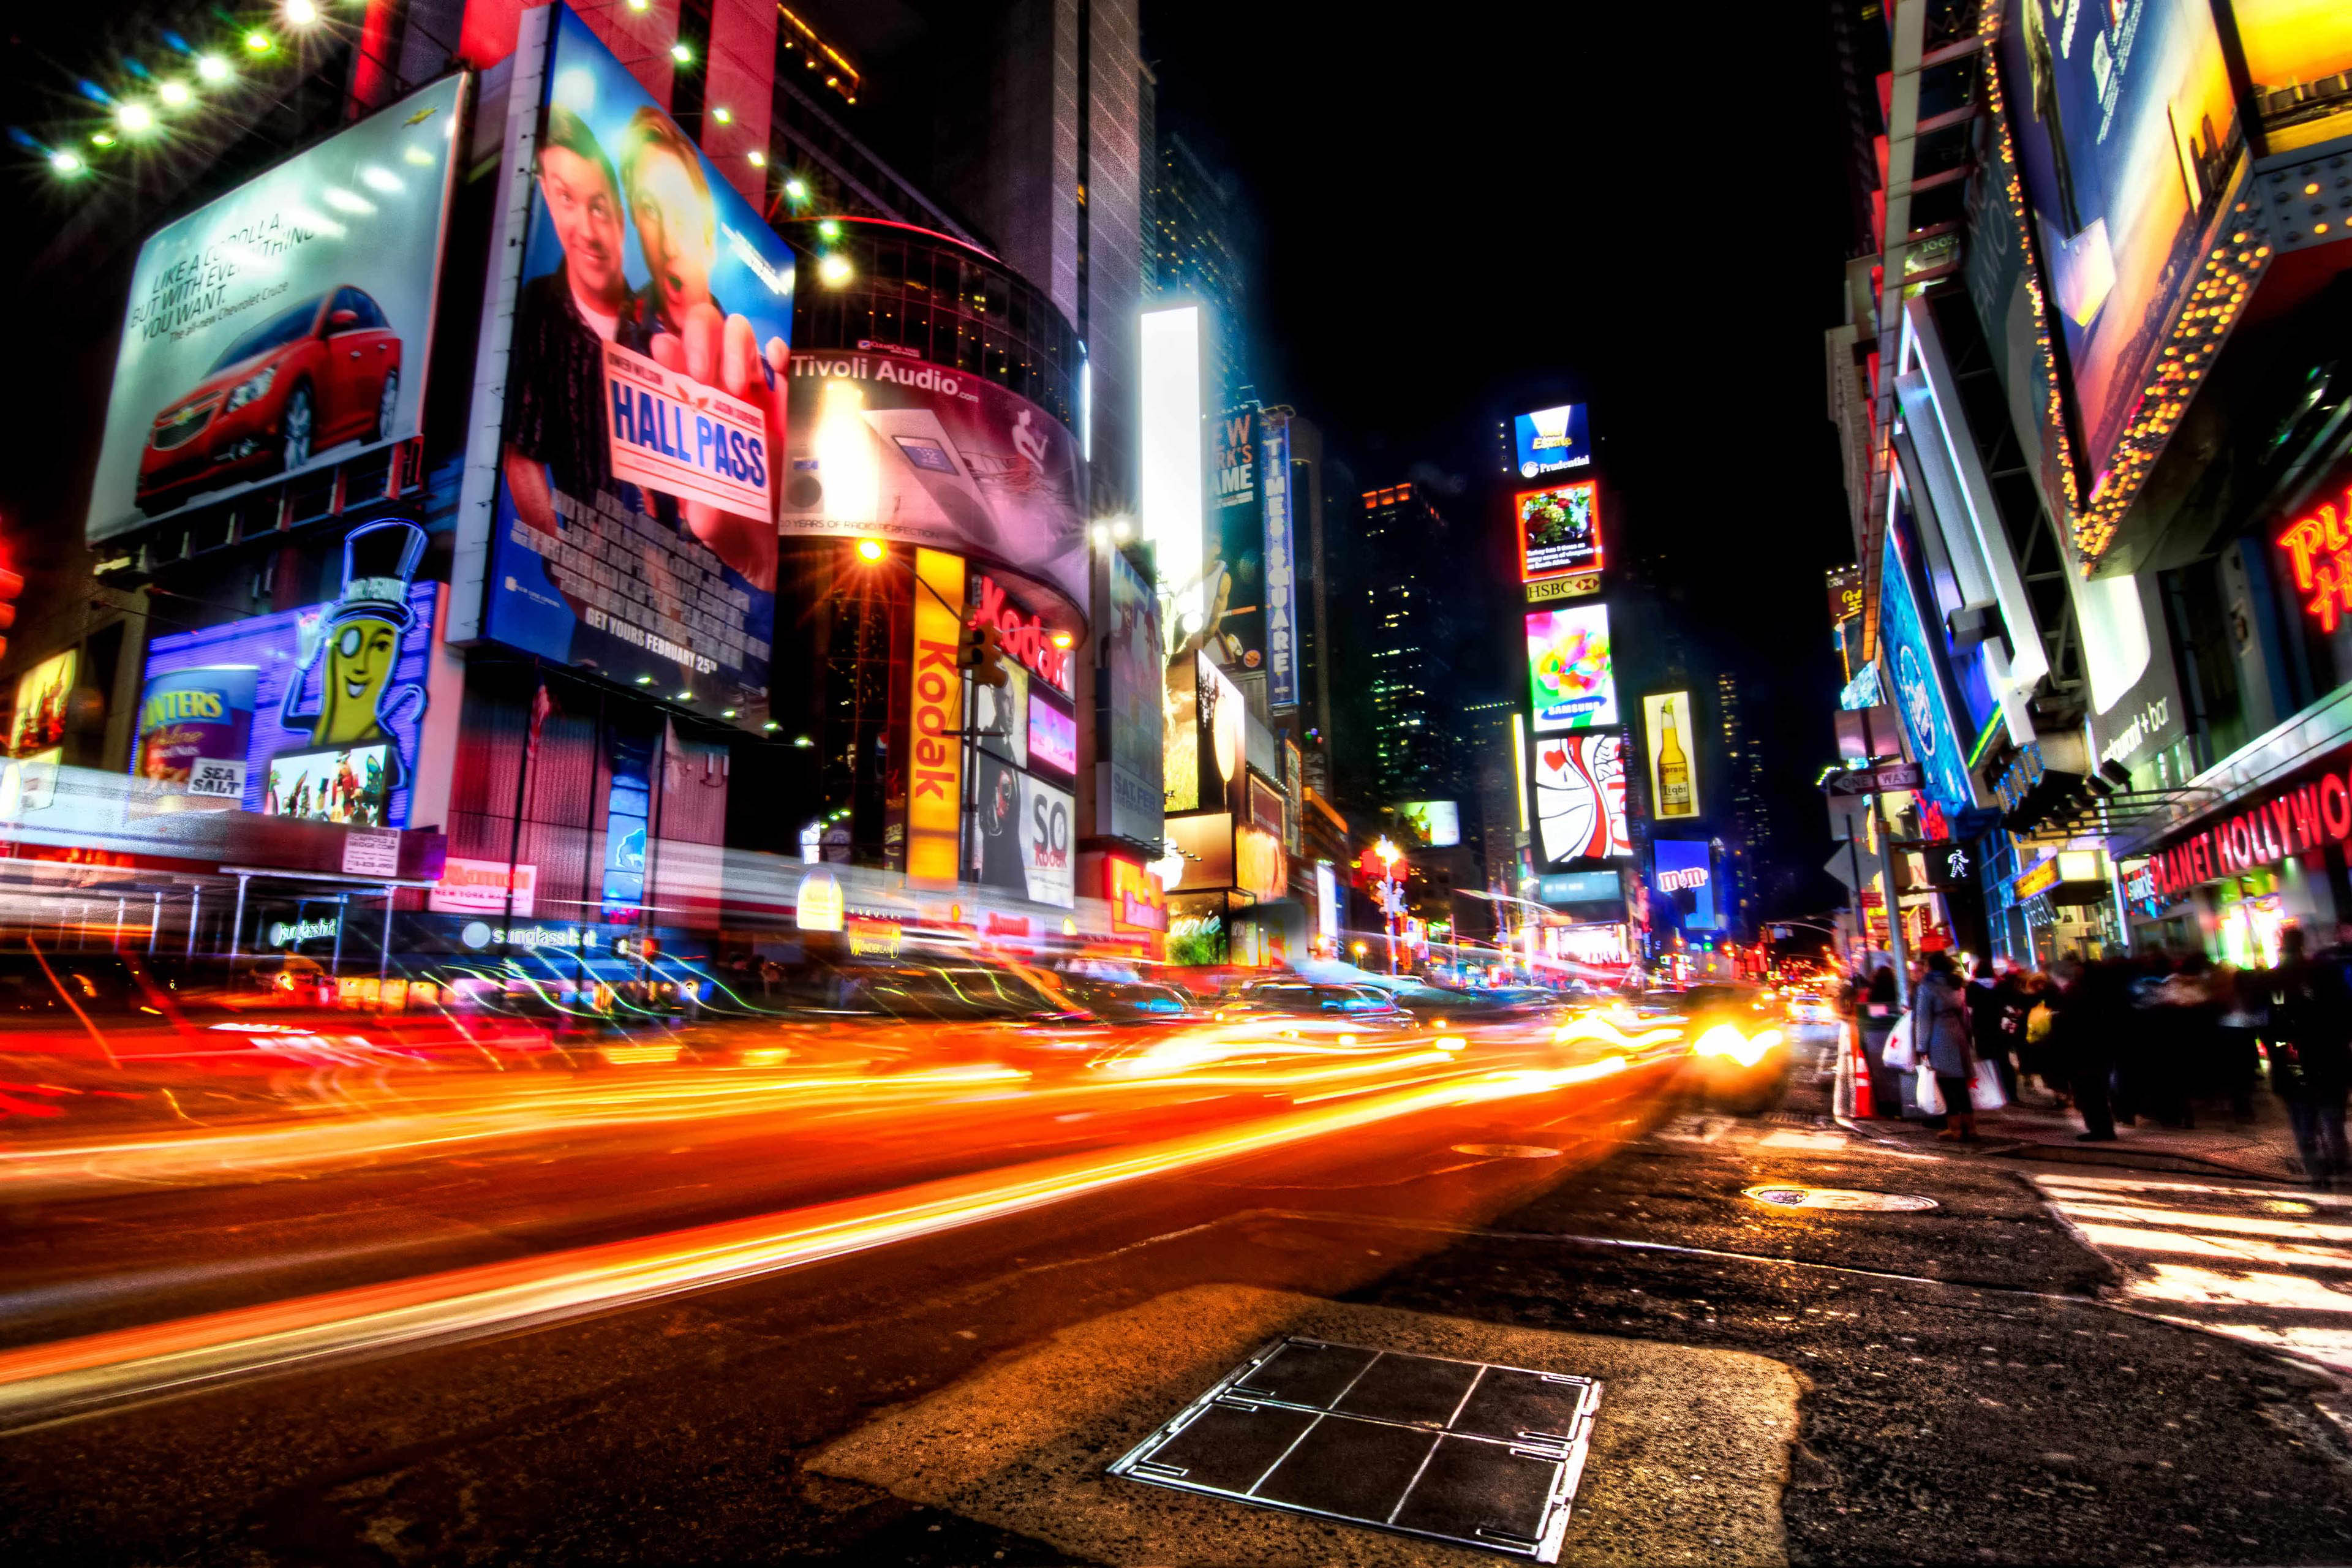 70+ Times Square Wallpaper on WallpaperSafari